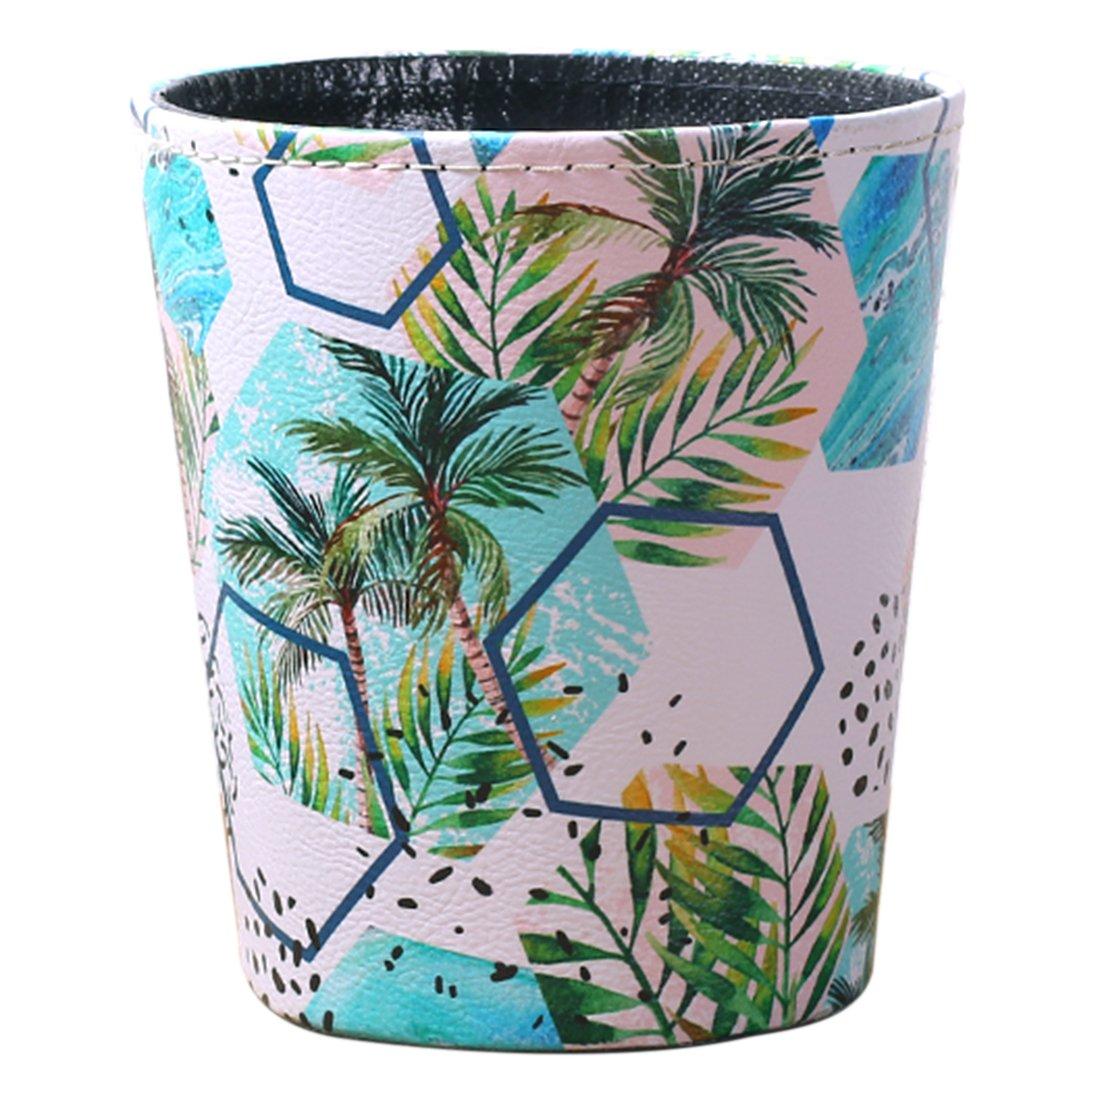 BOROK 10L Waterproof Vintage Office Rubbish Bin Waste Paper Bin Children Hawaiian, 25x 27cm, PU, Typ 2, 25 x 27cm